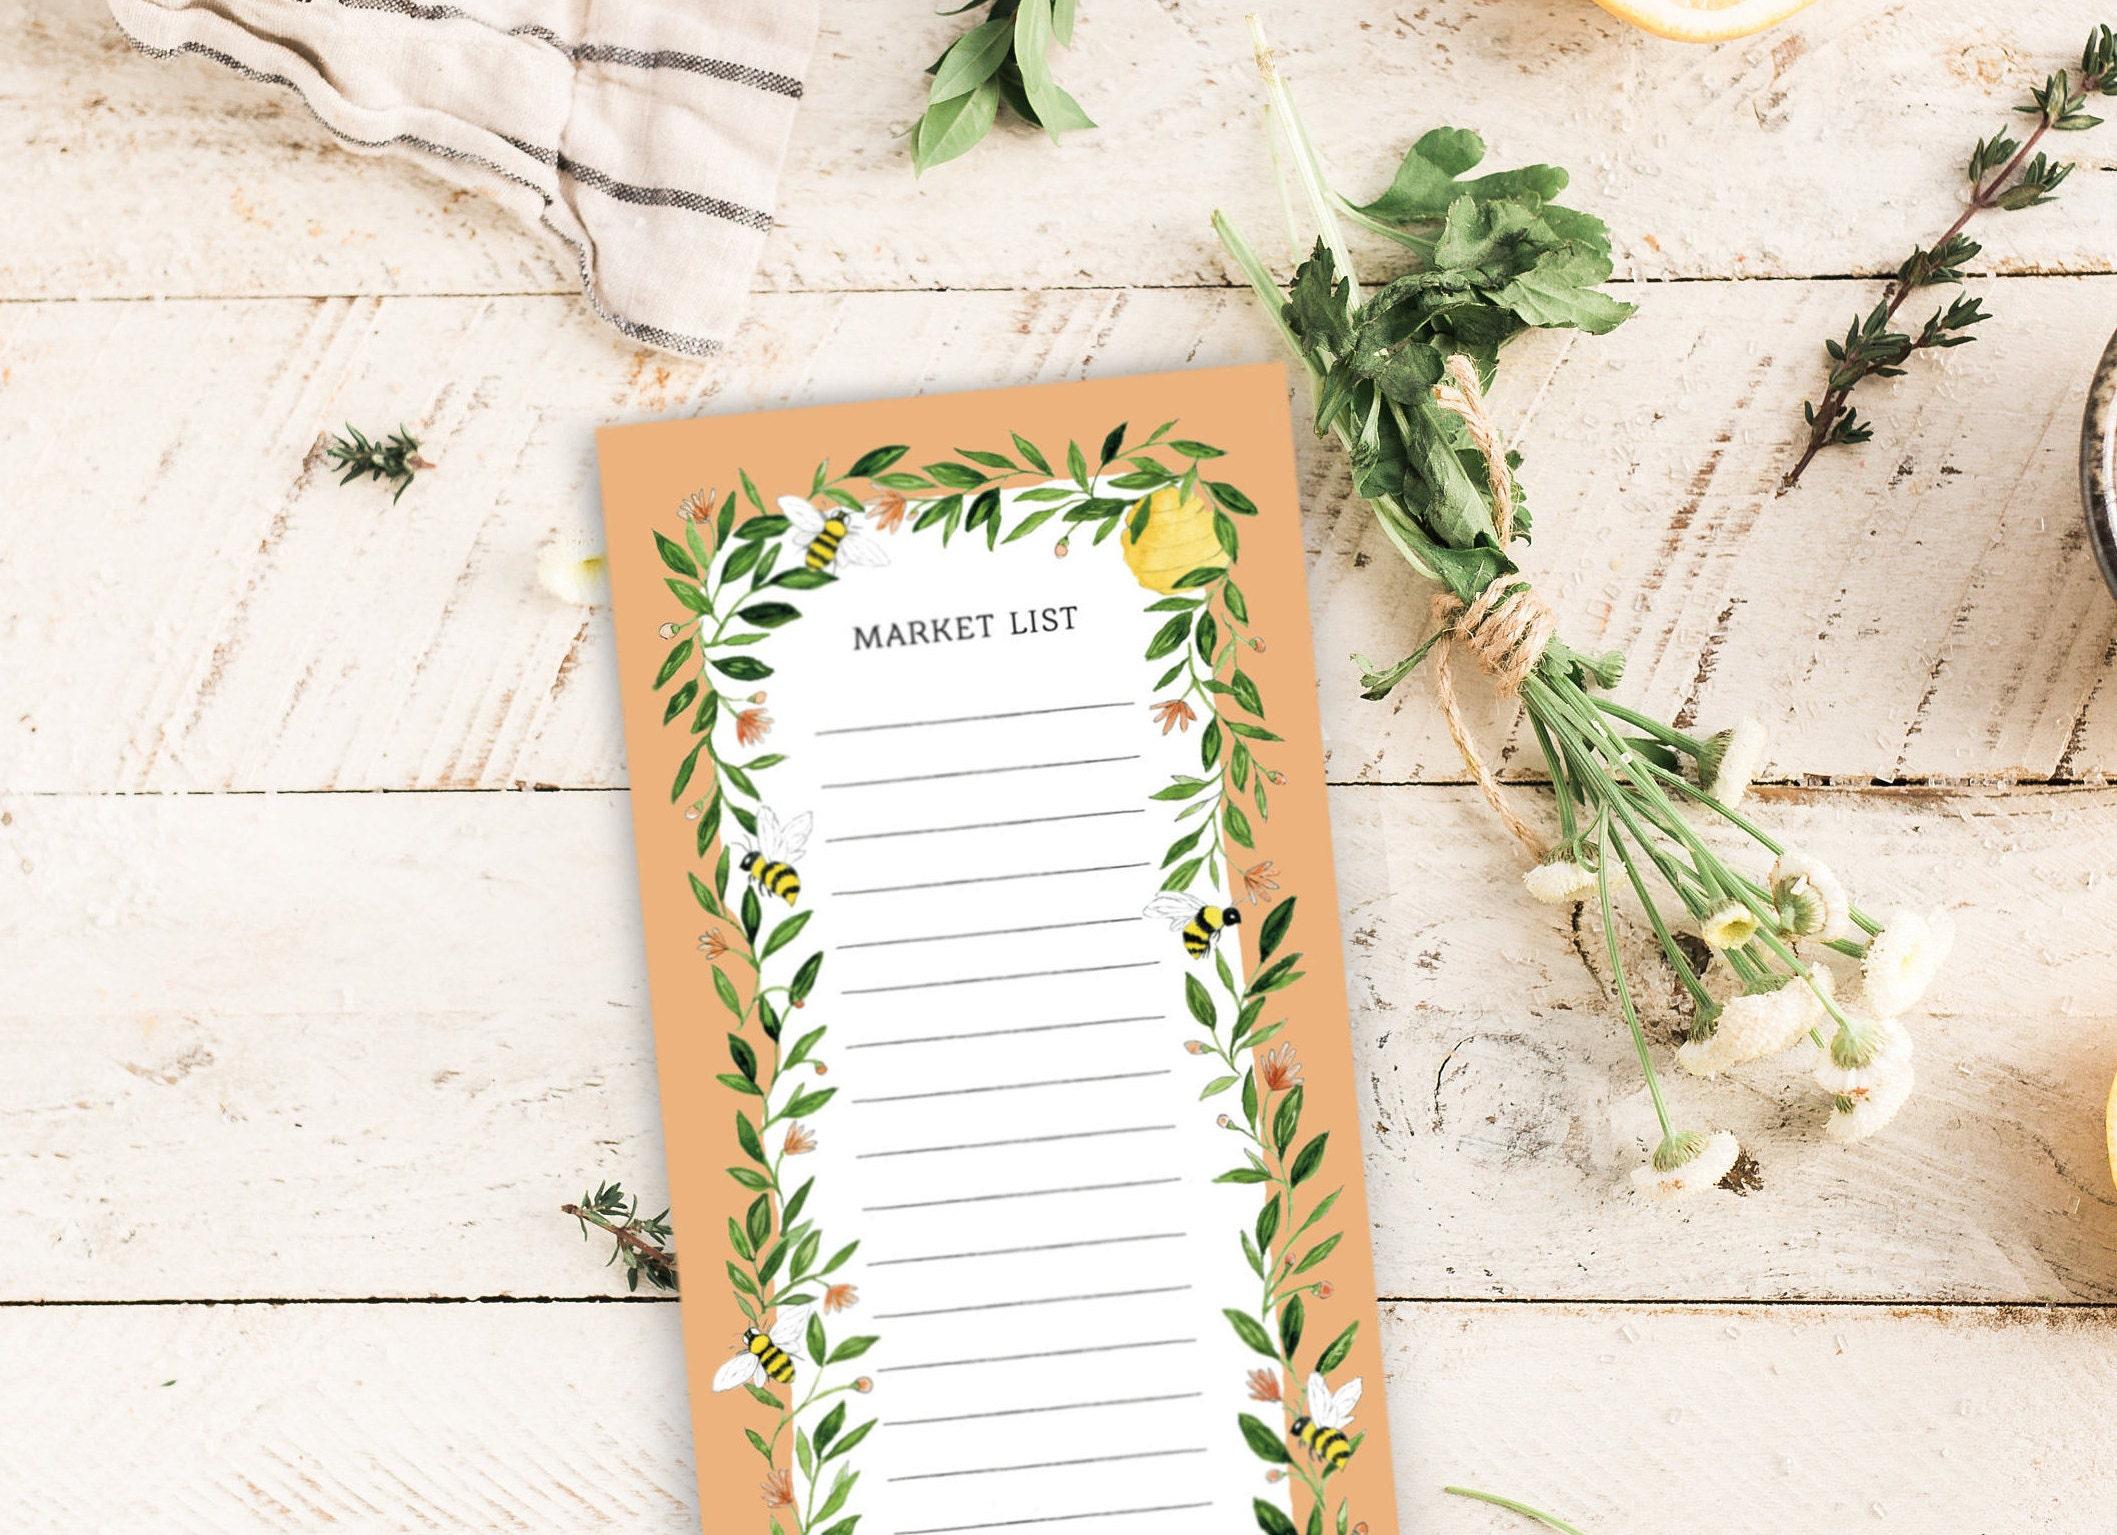 market list geschenk mama geschenk weihnachten papierwaren etsy. Black Bedroom Furniture Sets. Home Design Ideas